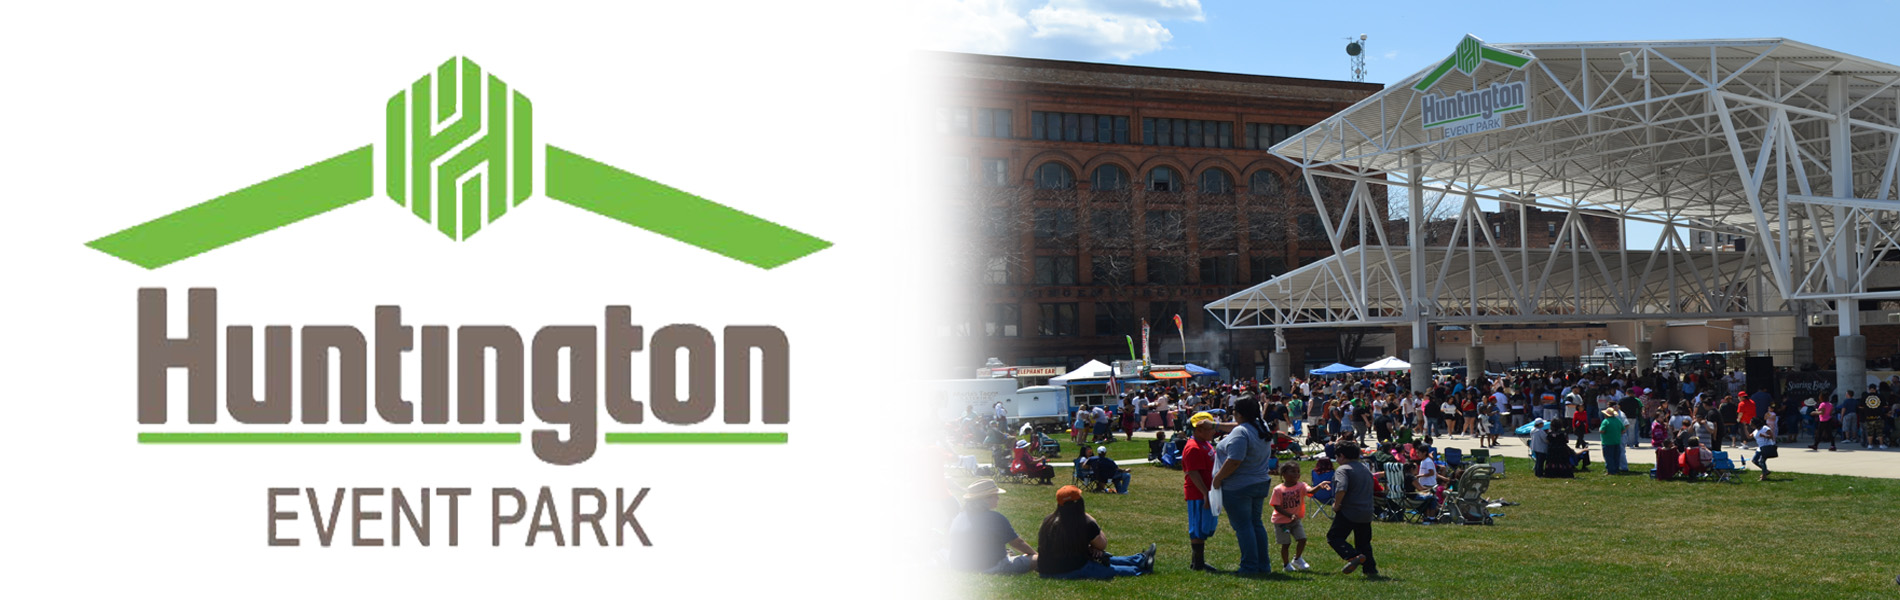 Huntington Event Park Banner